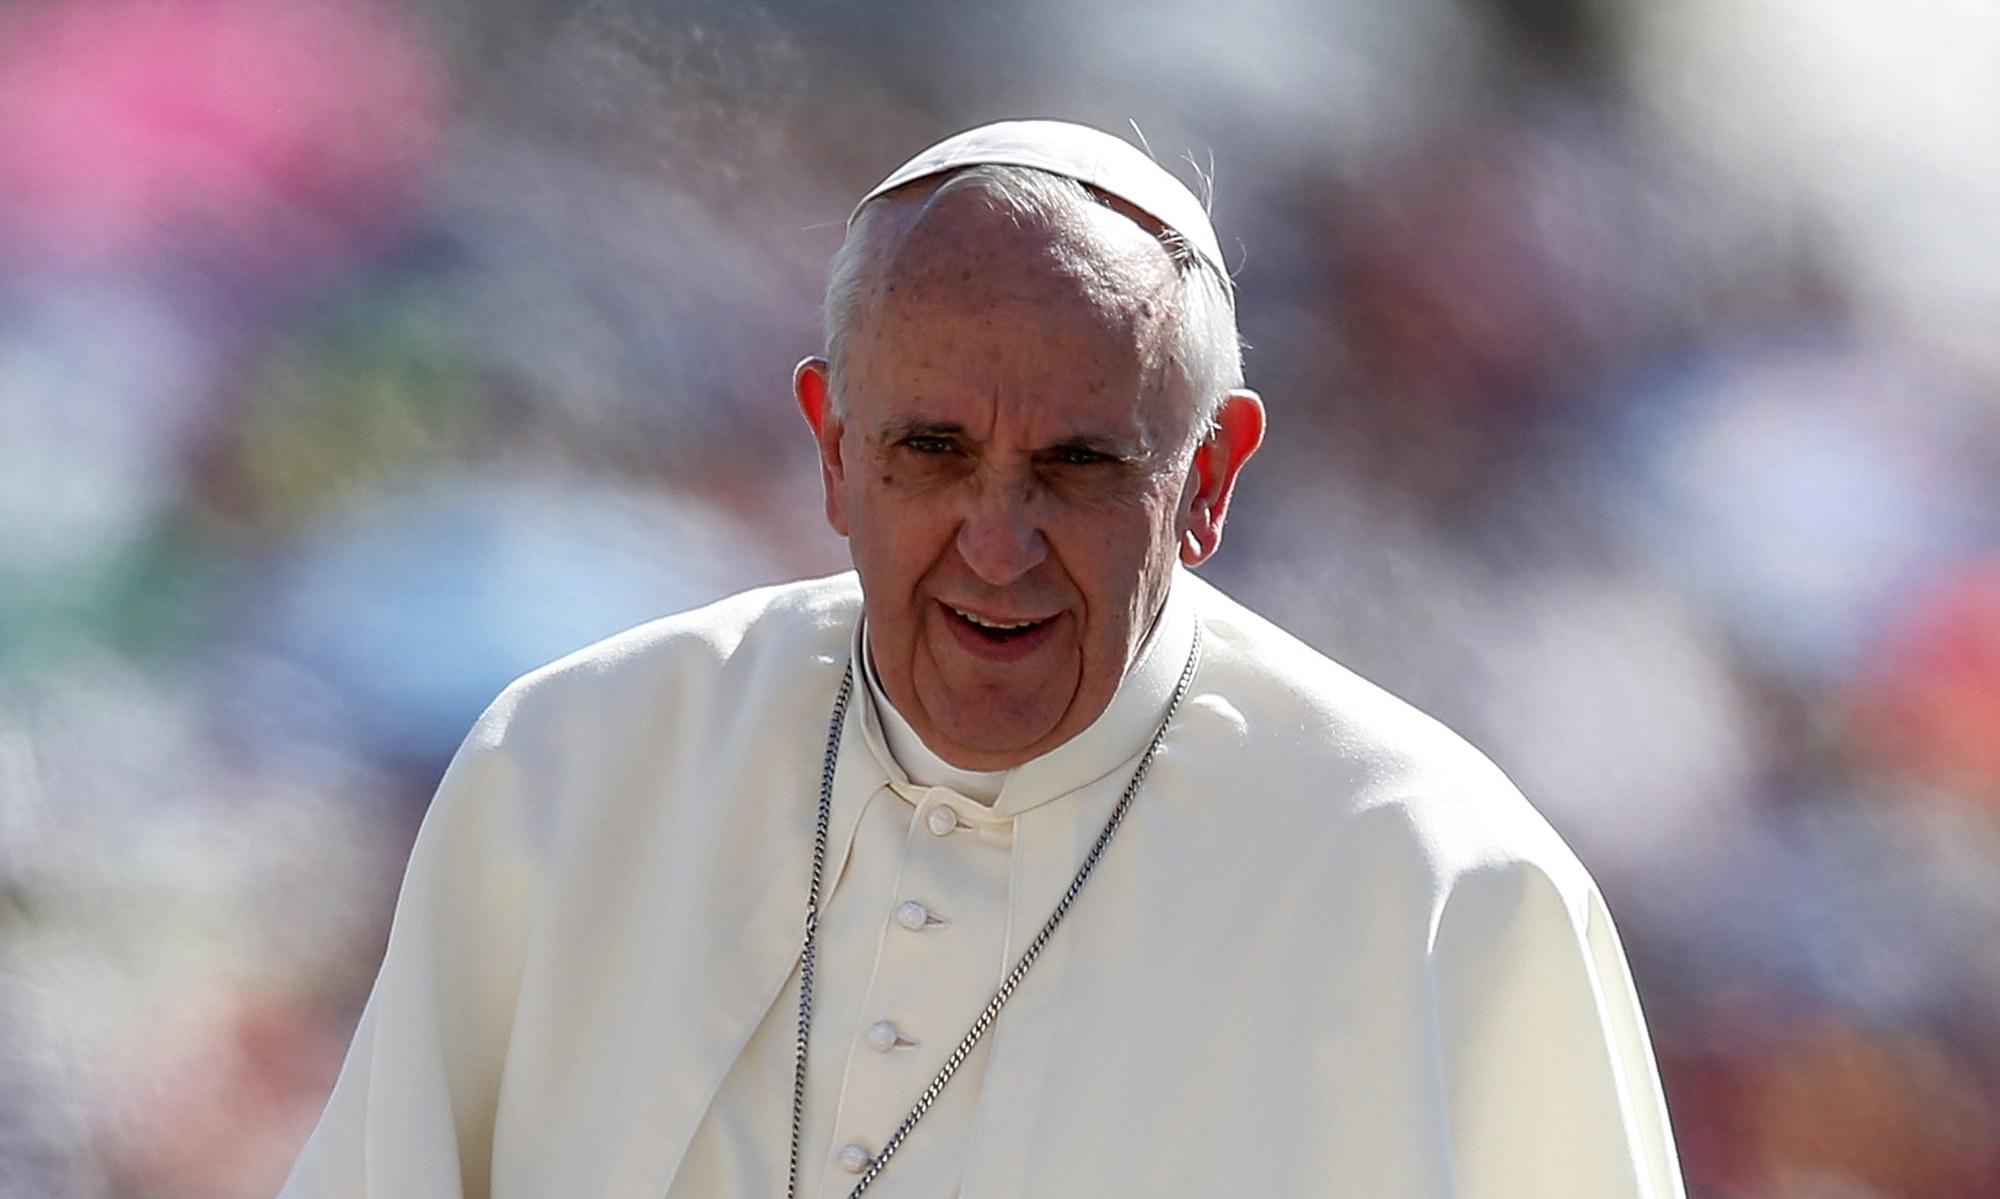 Порно папа римский